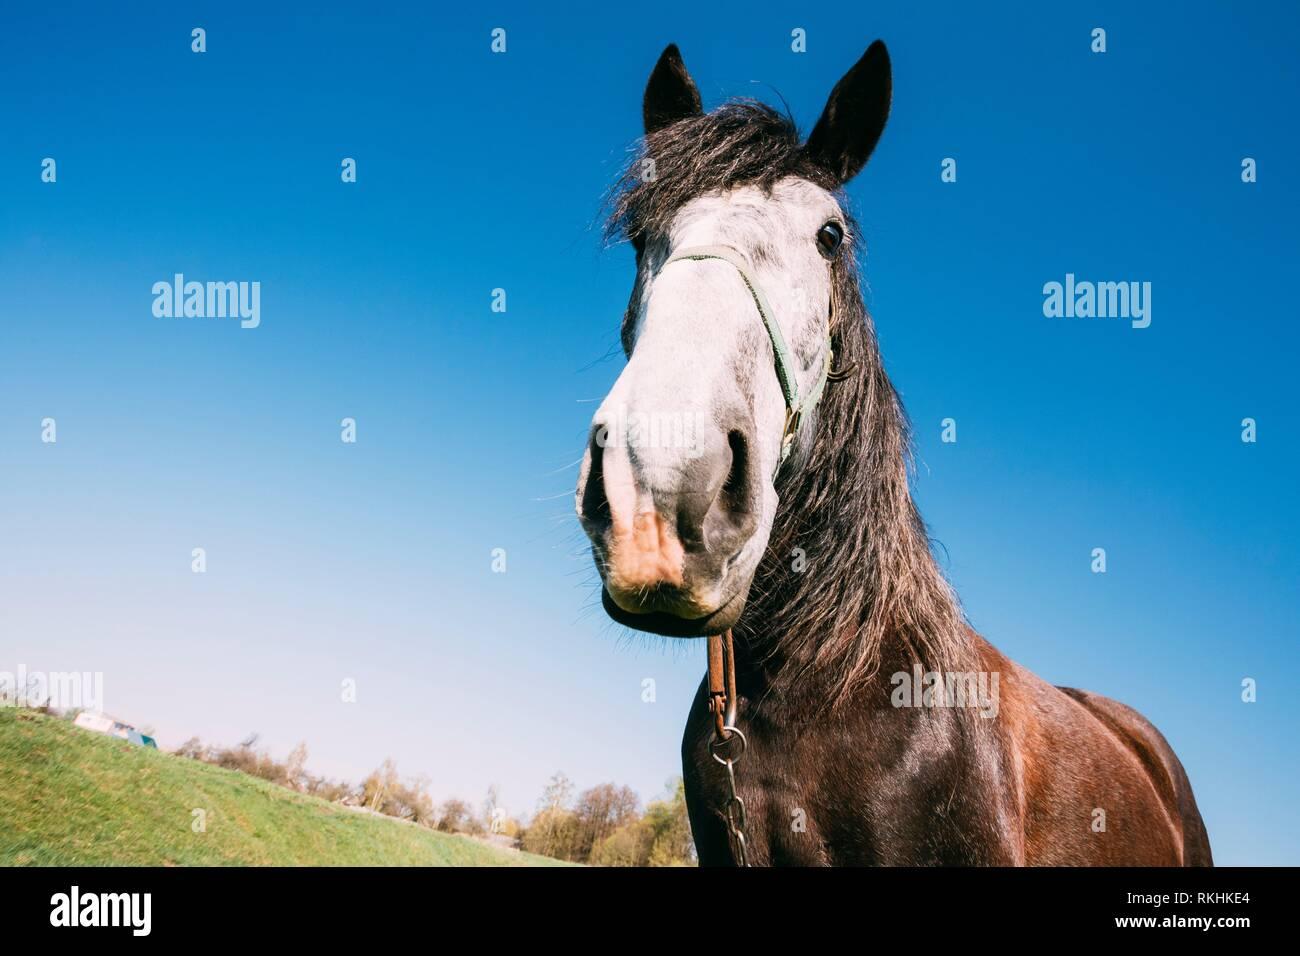 Gomel, Belarus. Close Up Of Funny Portrait On Wide Angle Lens Of Horse On Blue Sky Background. Big Head. Lens Distortion. - Stock Image